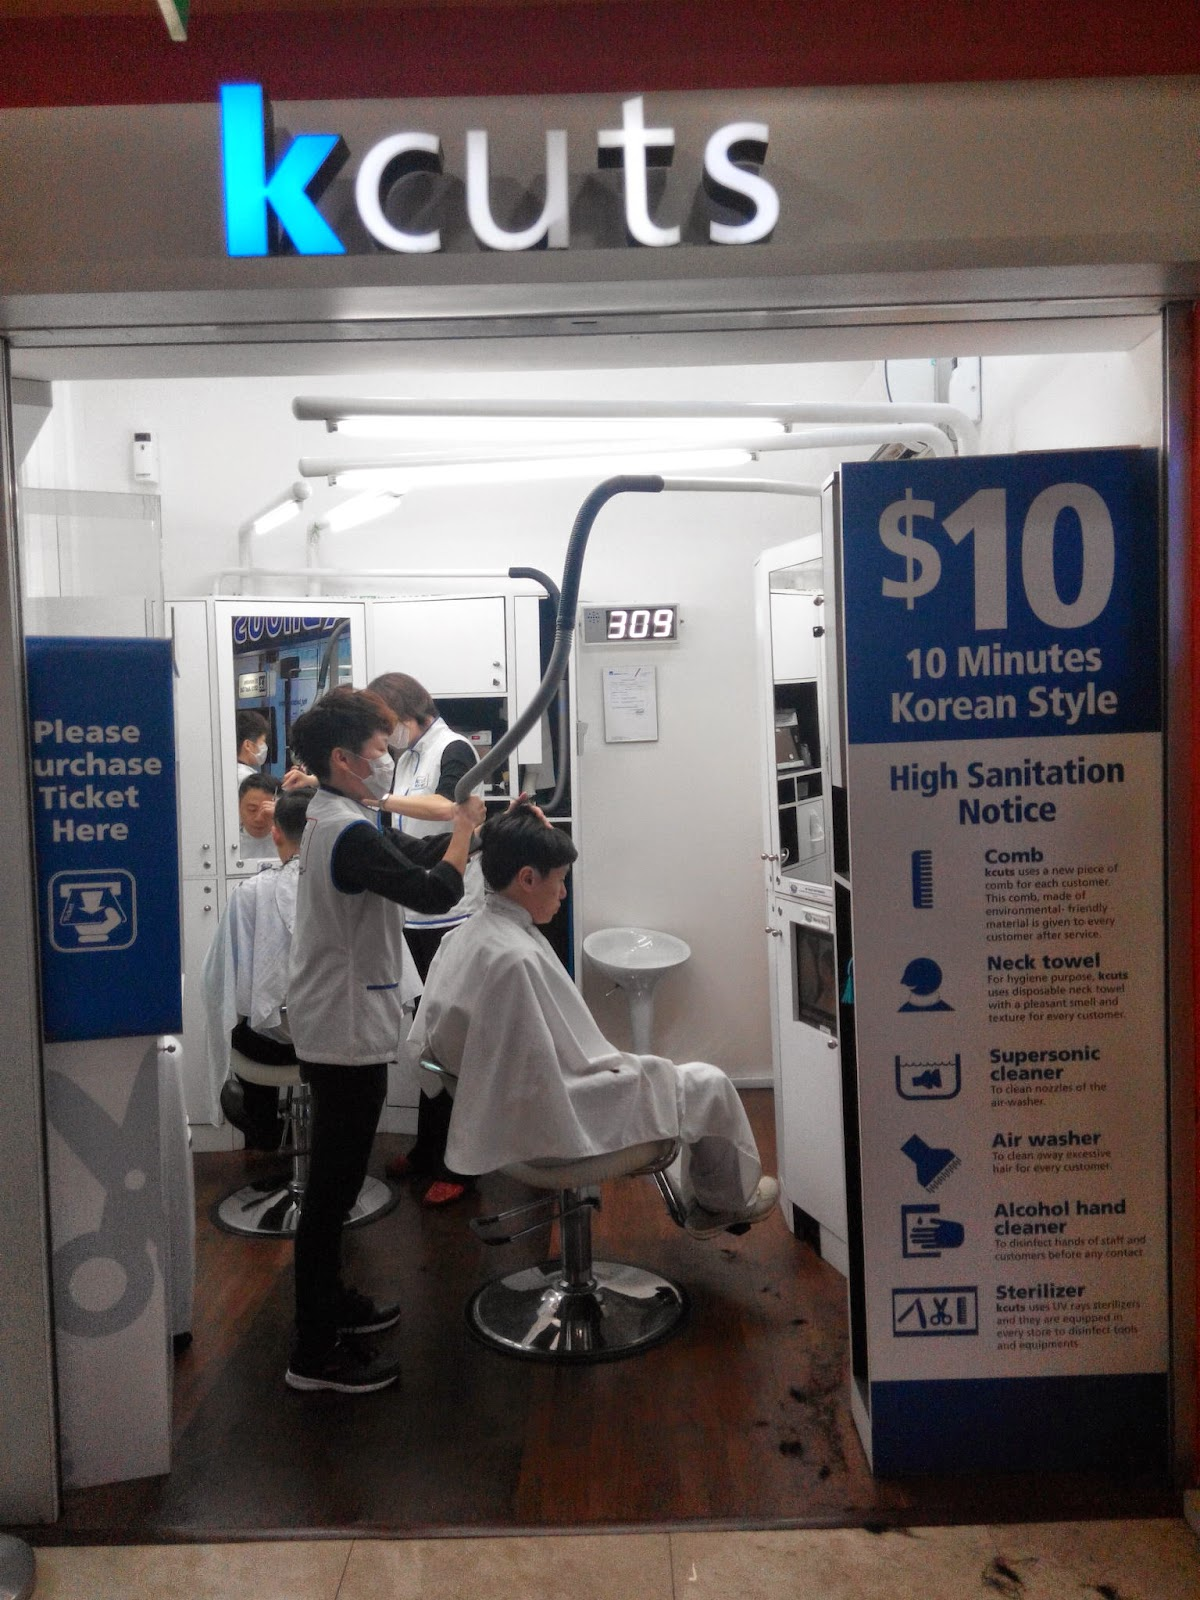 kcuts barbershop, Holland Village outlet, Singapore